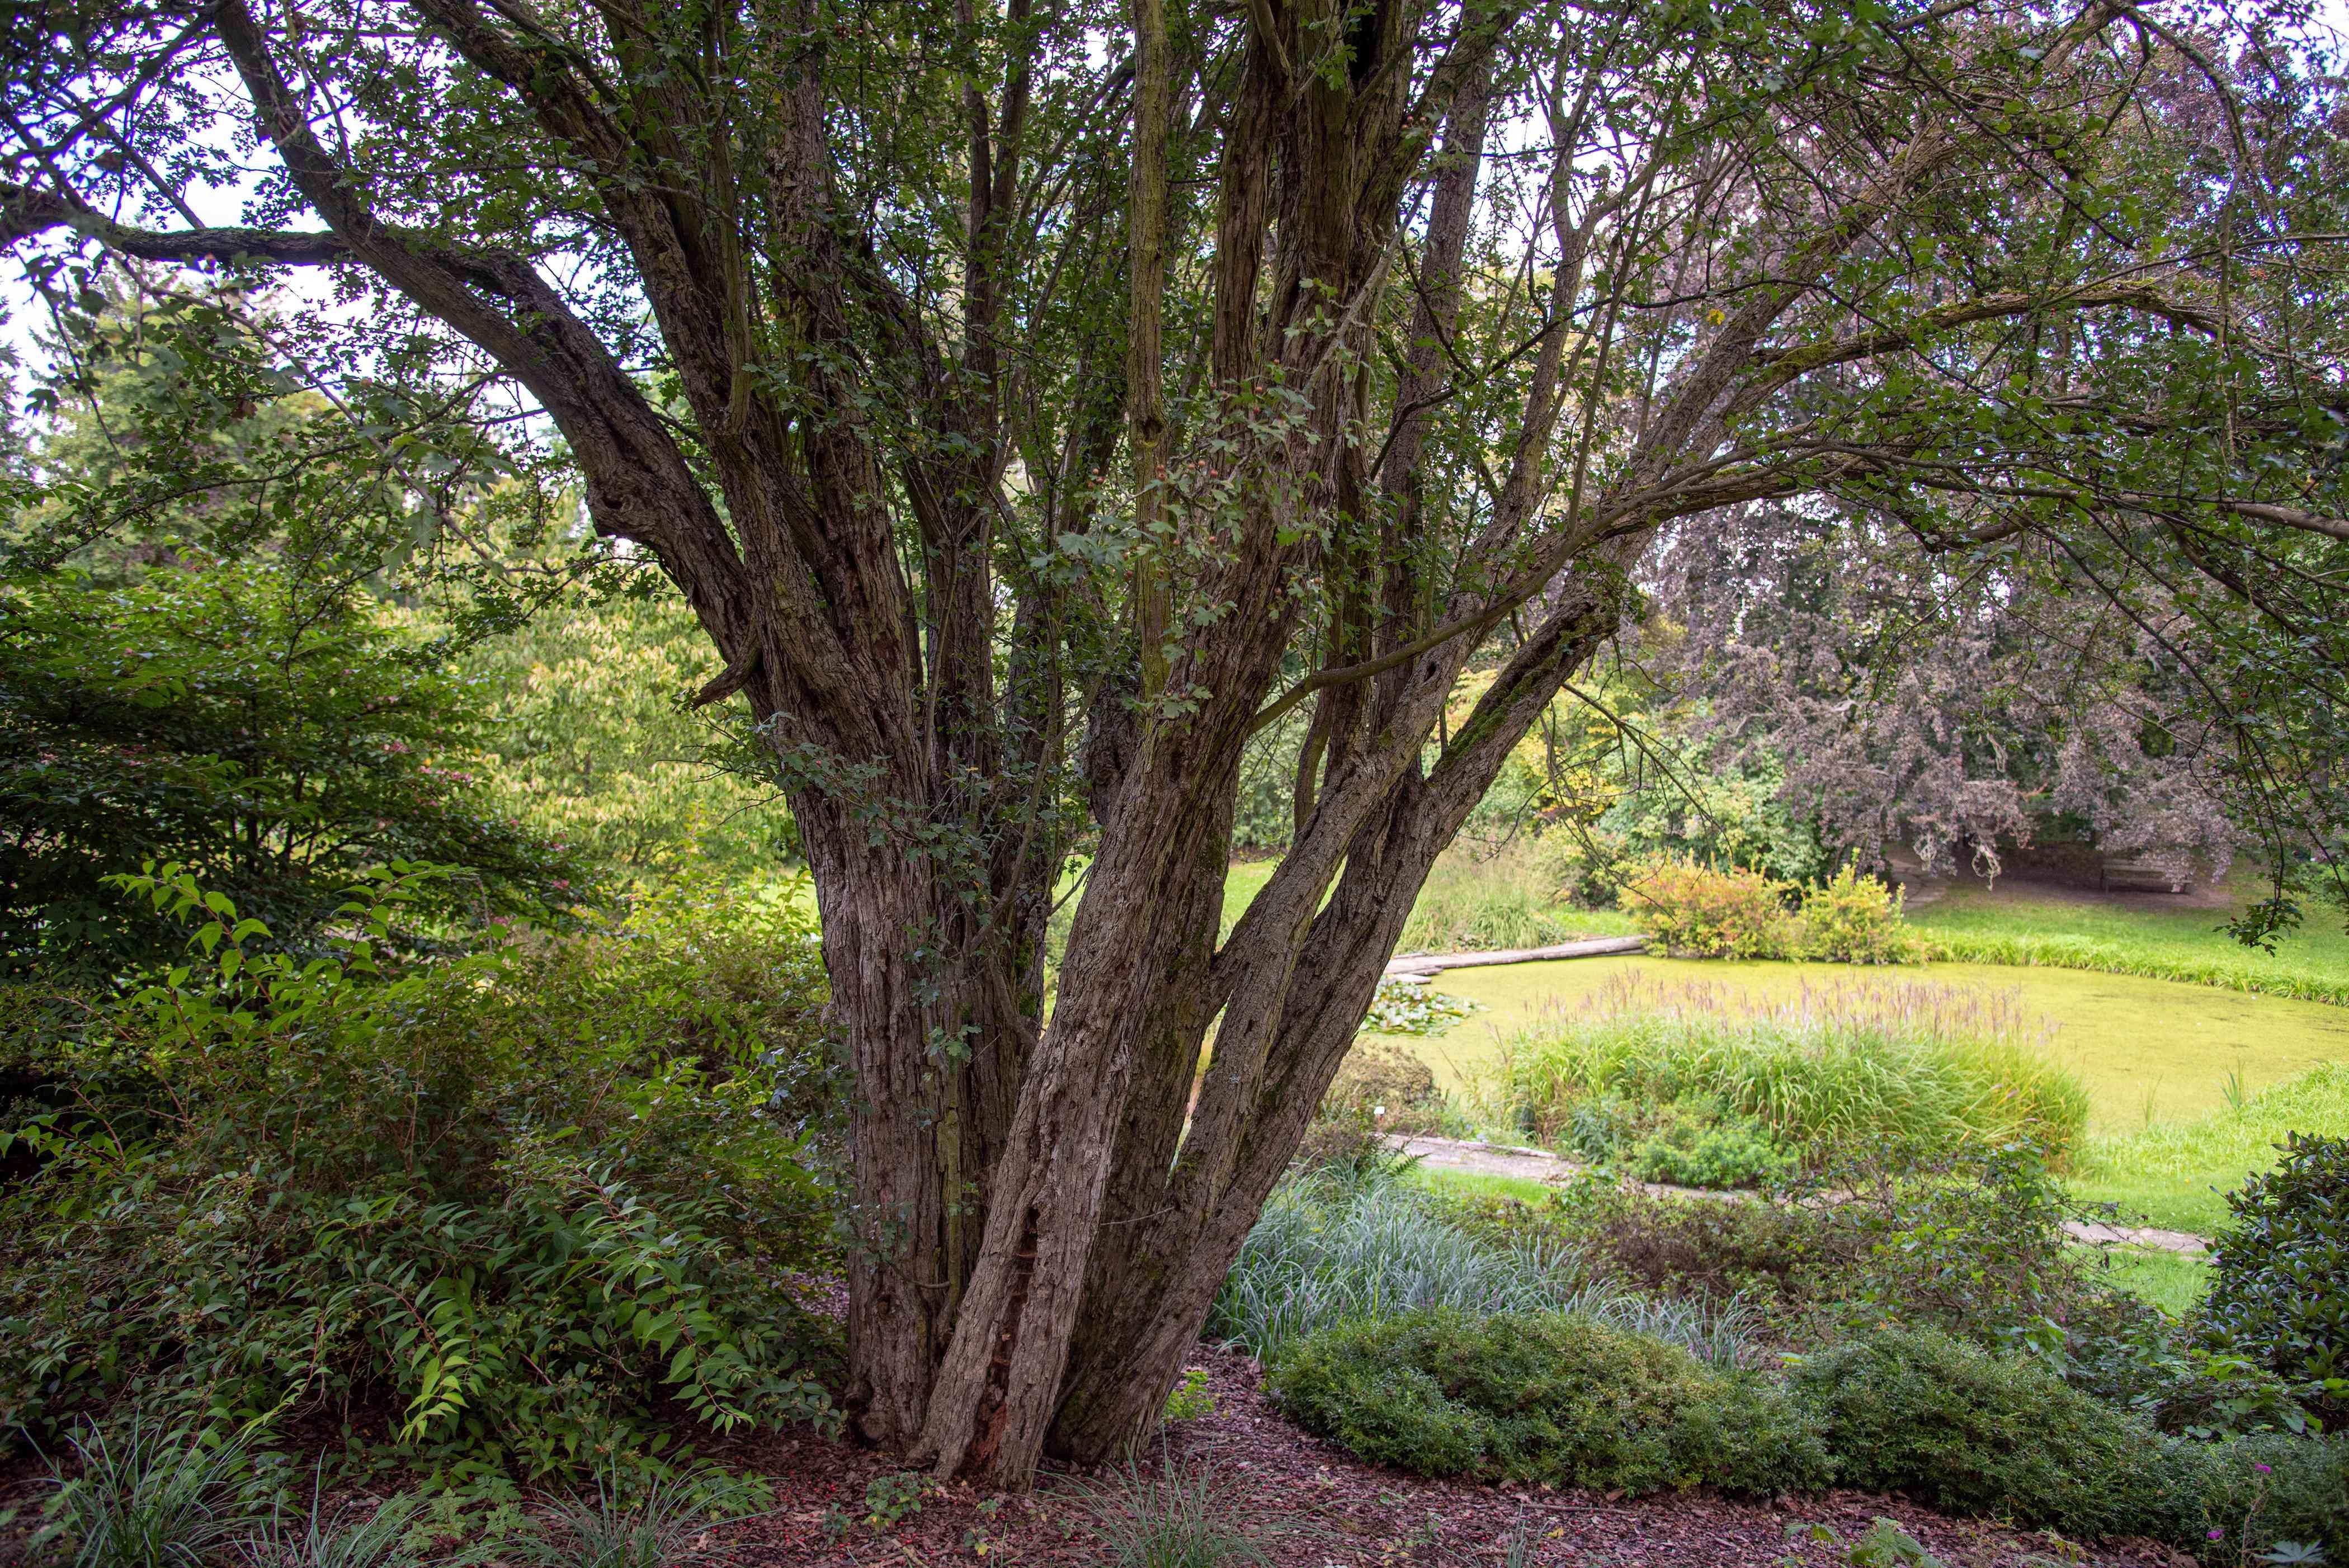 English hawthorn tree with multiple trunks sprawling upwards in garden